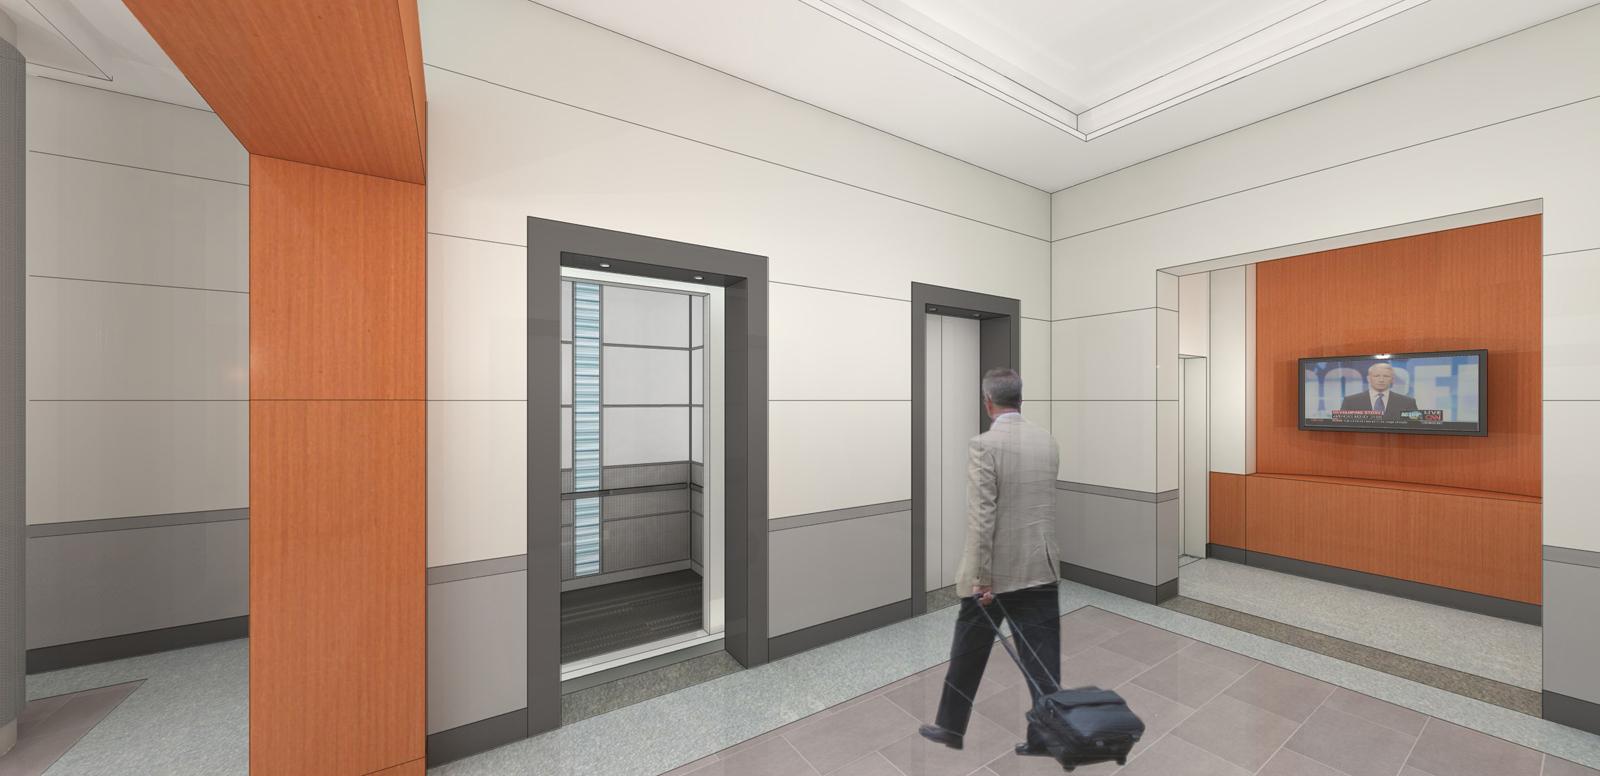 Cam 5 - elevator